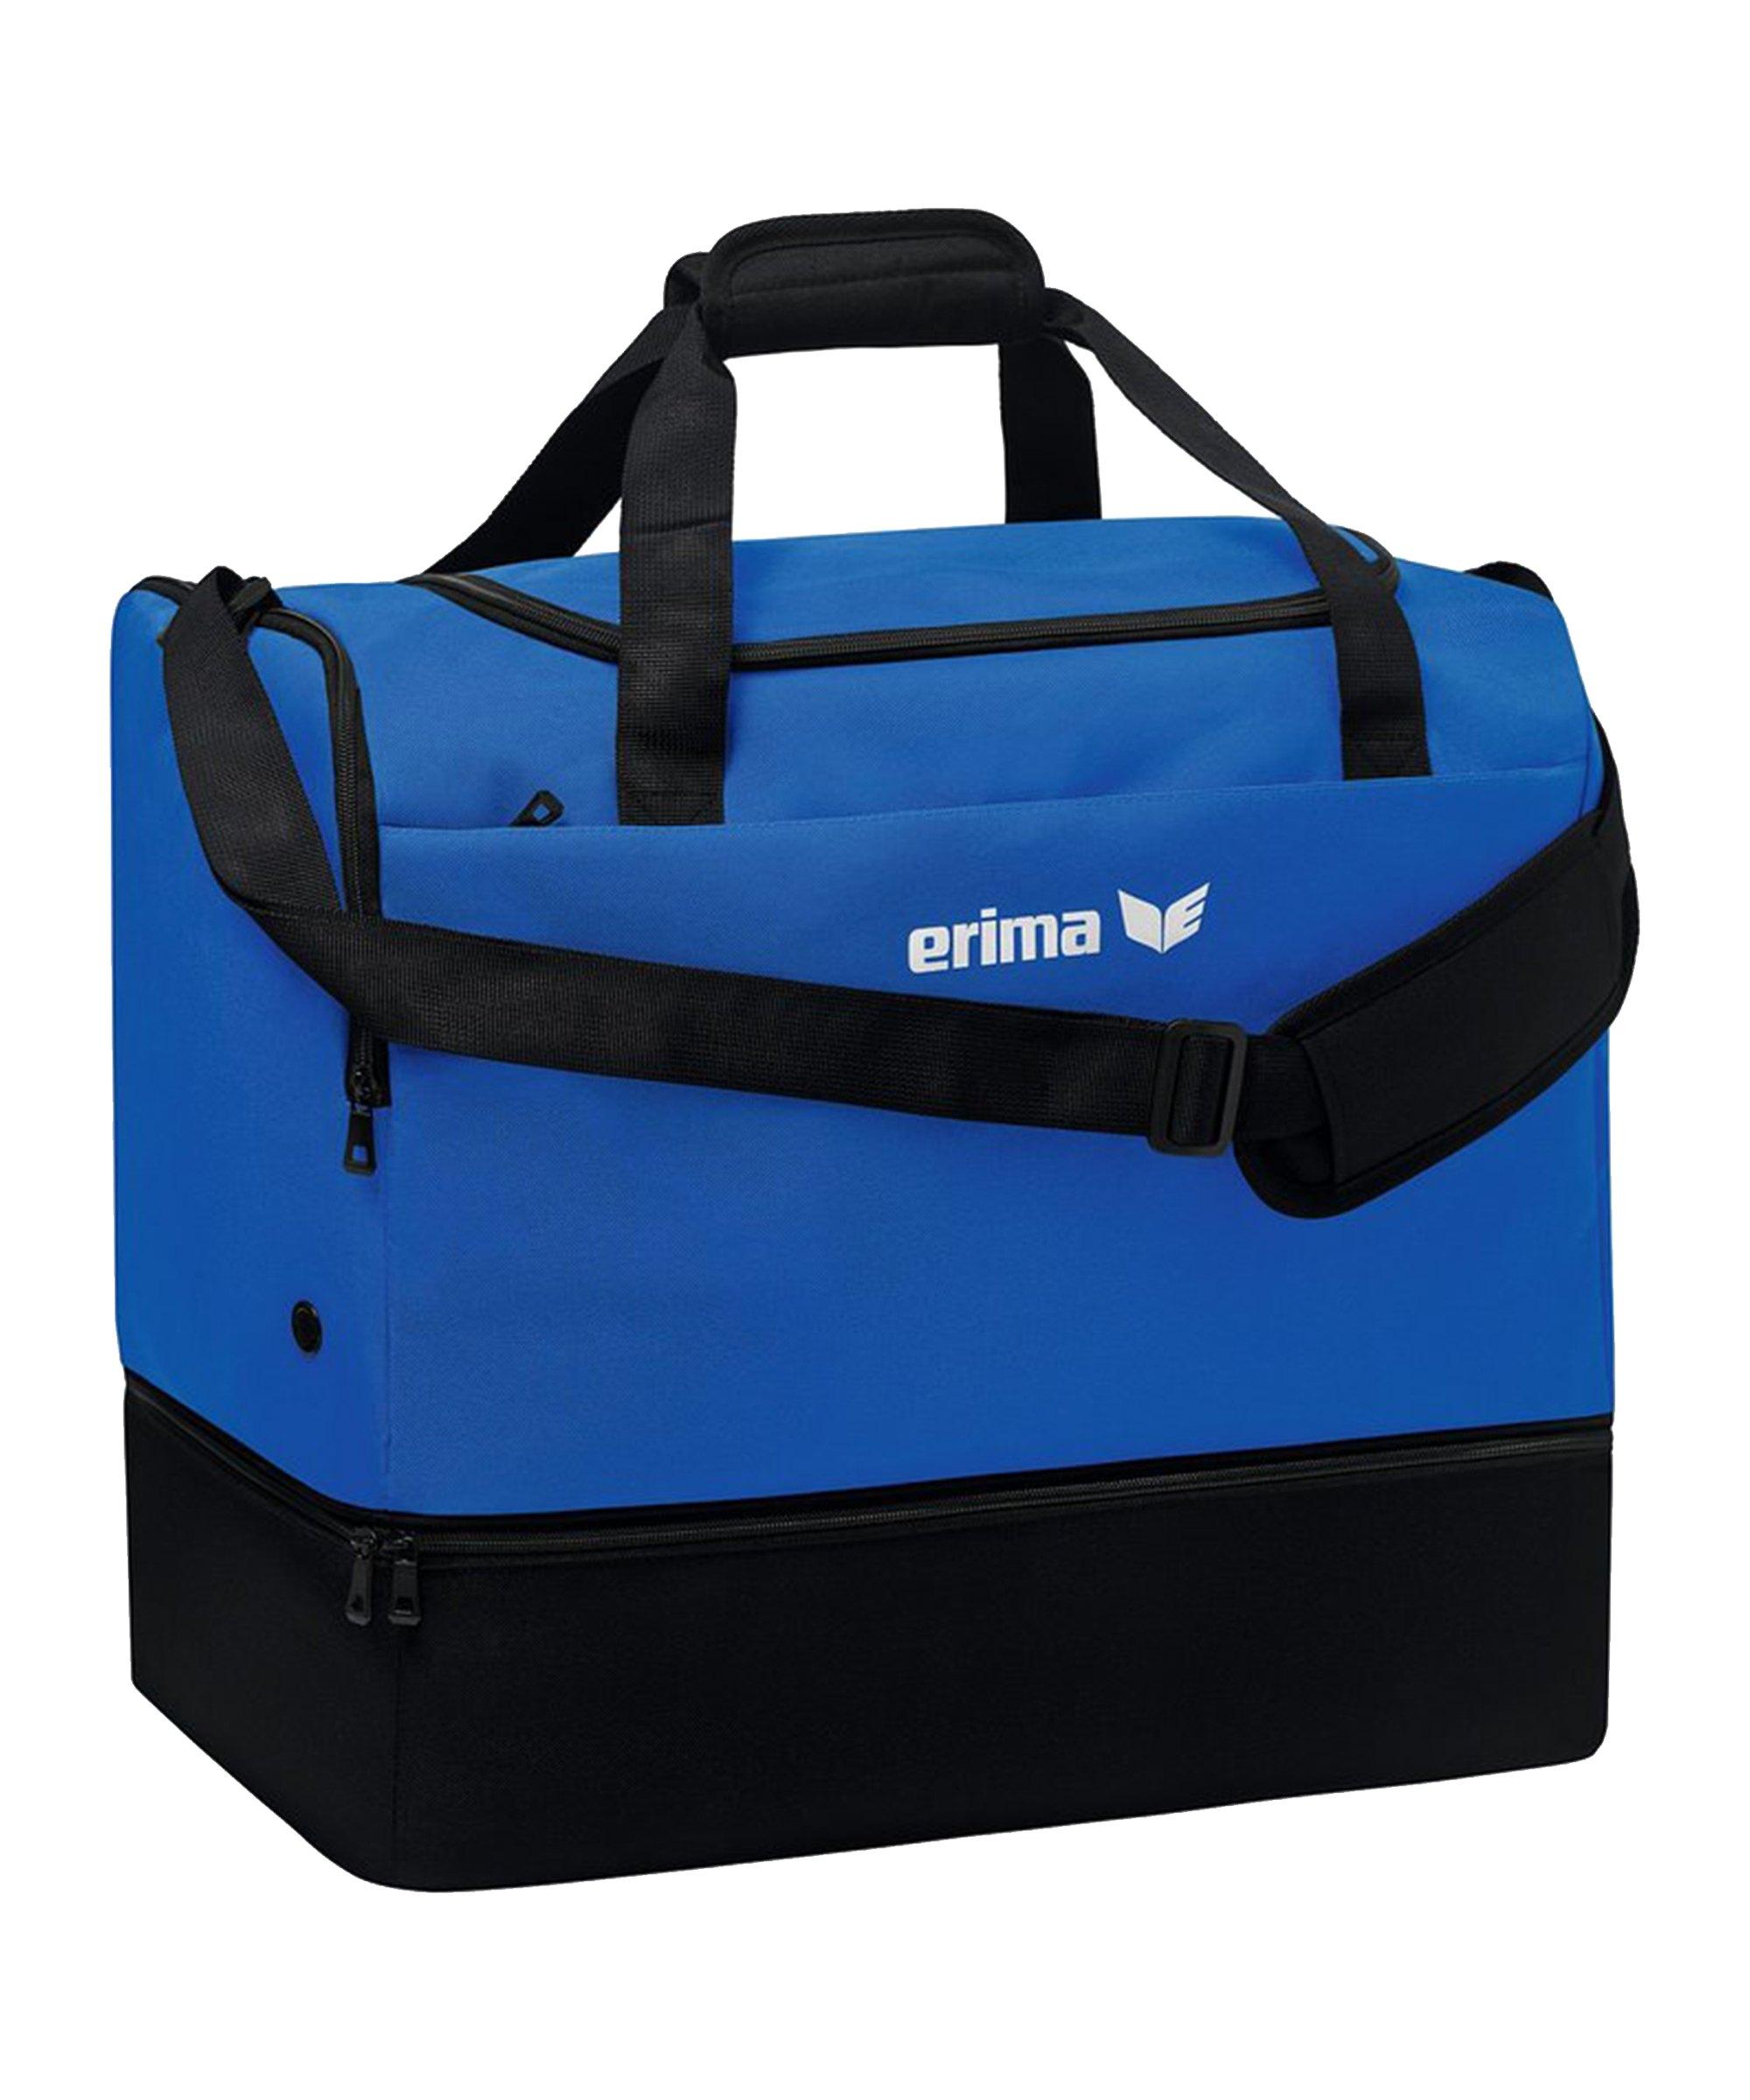 Erima TEAM Sporttasche Gr.M Blau - blau